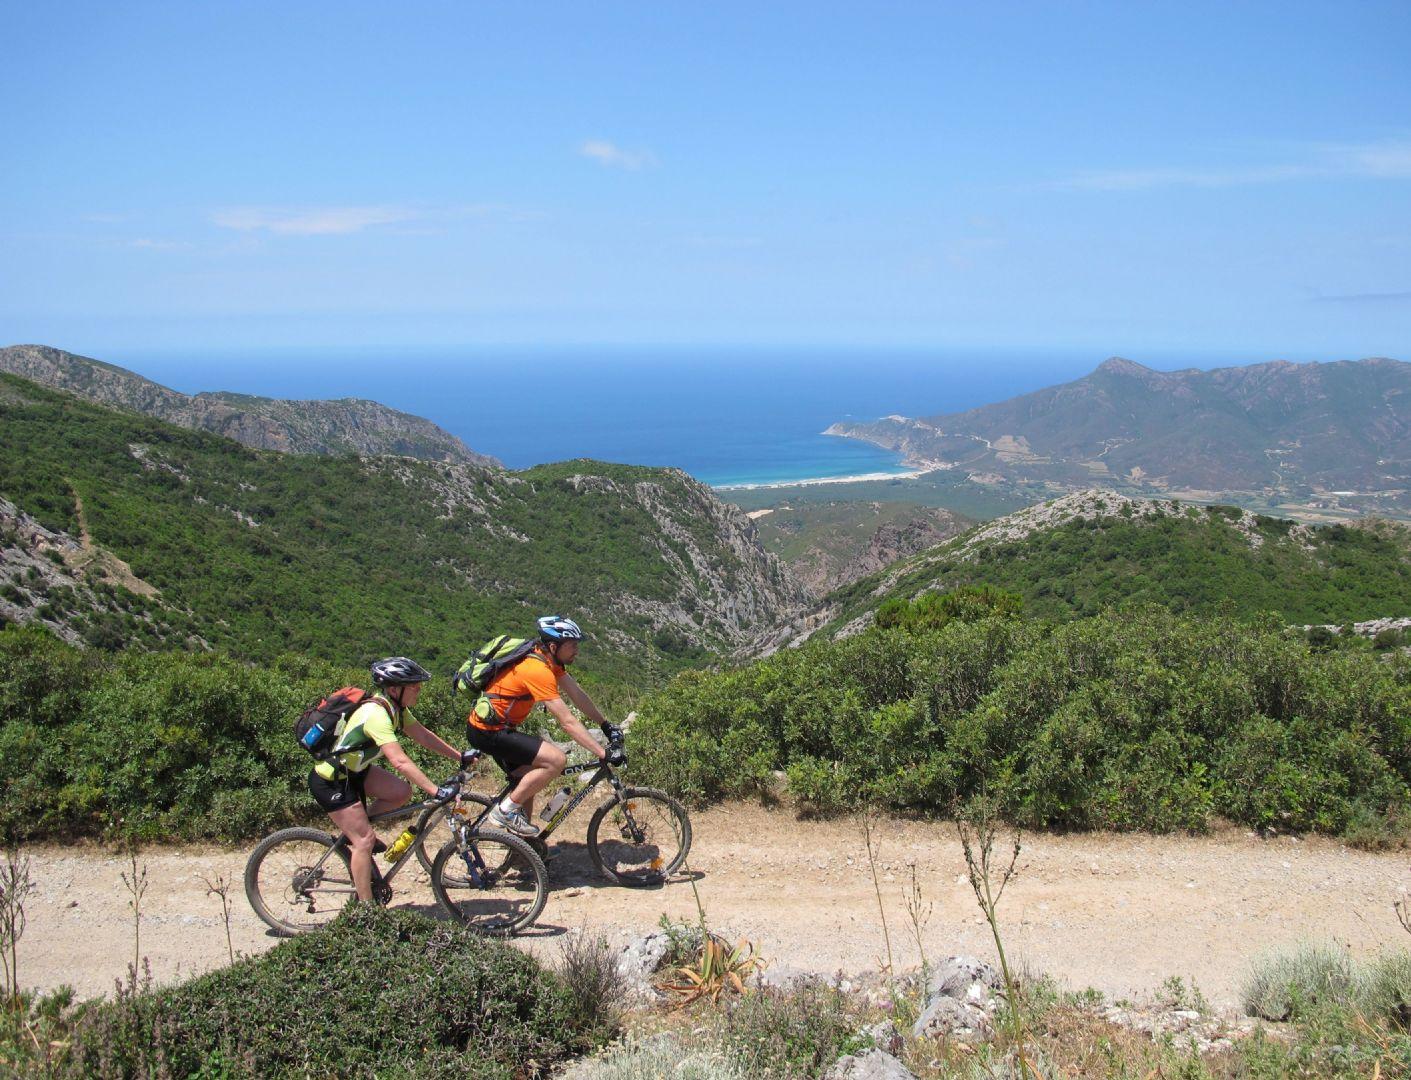 IMG_1741bisQuaddu murru.jpg - Sardinia - La Costa Verde - Guided Mountain Bike Holiday - Italia Mountain Biking